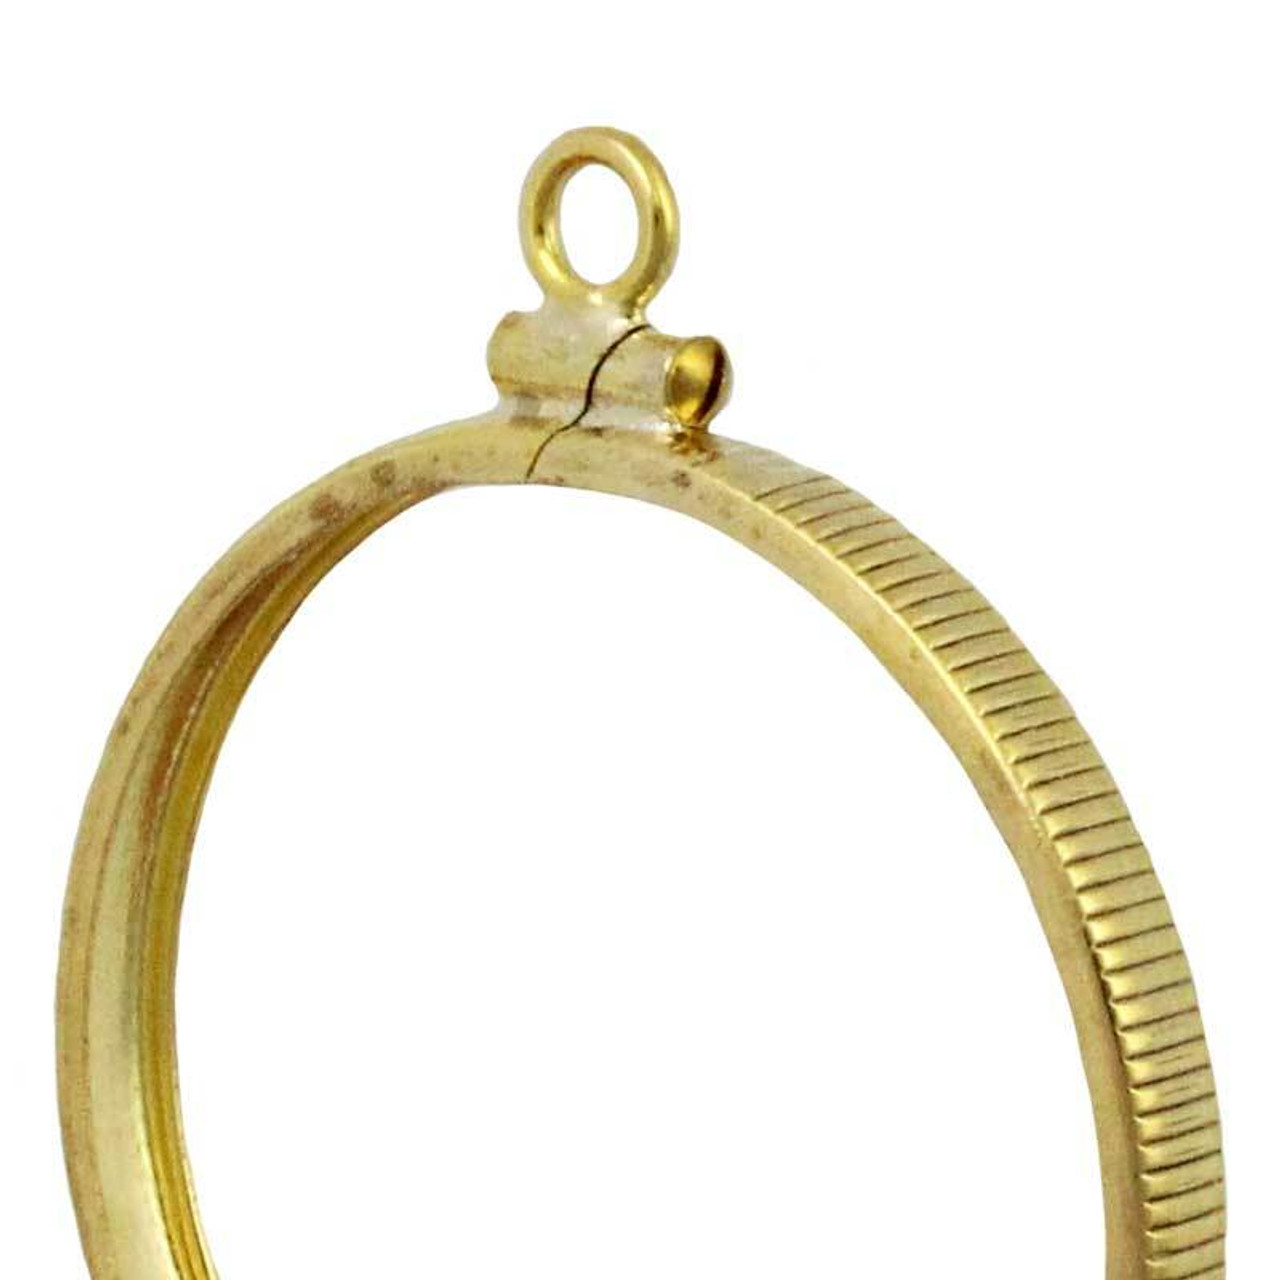 14K British 1 Lb One Pound Coin Bezel Holder CharmPendant Yellow Gold